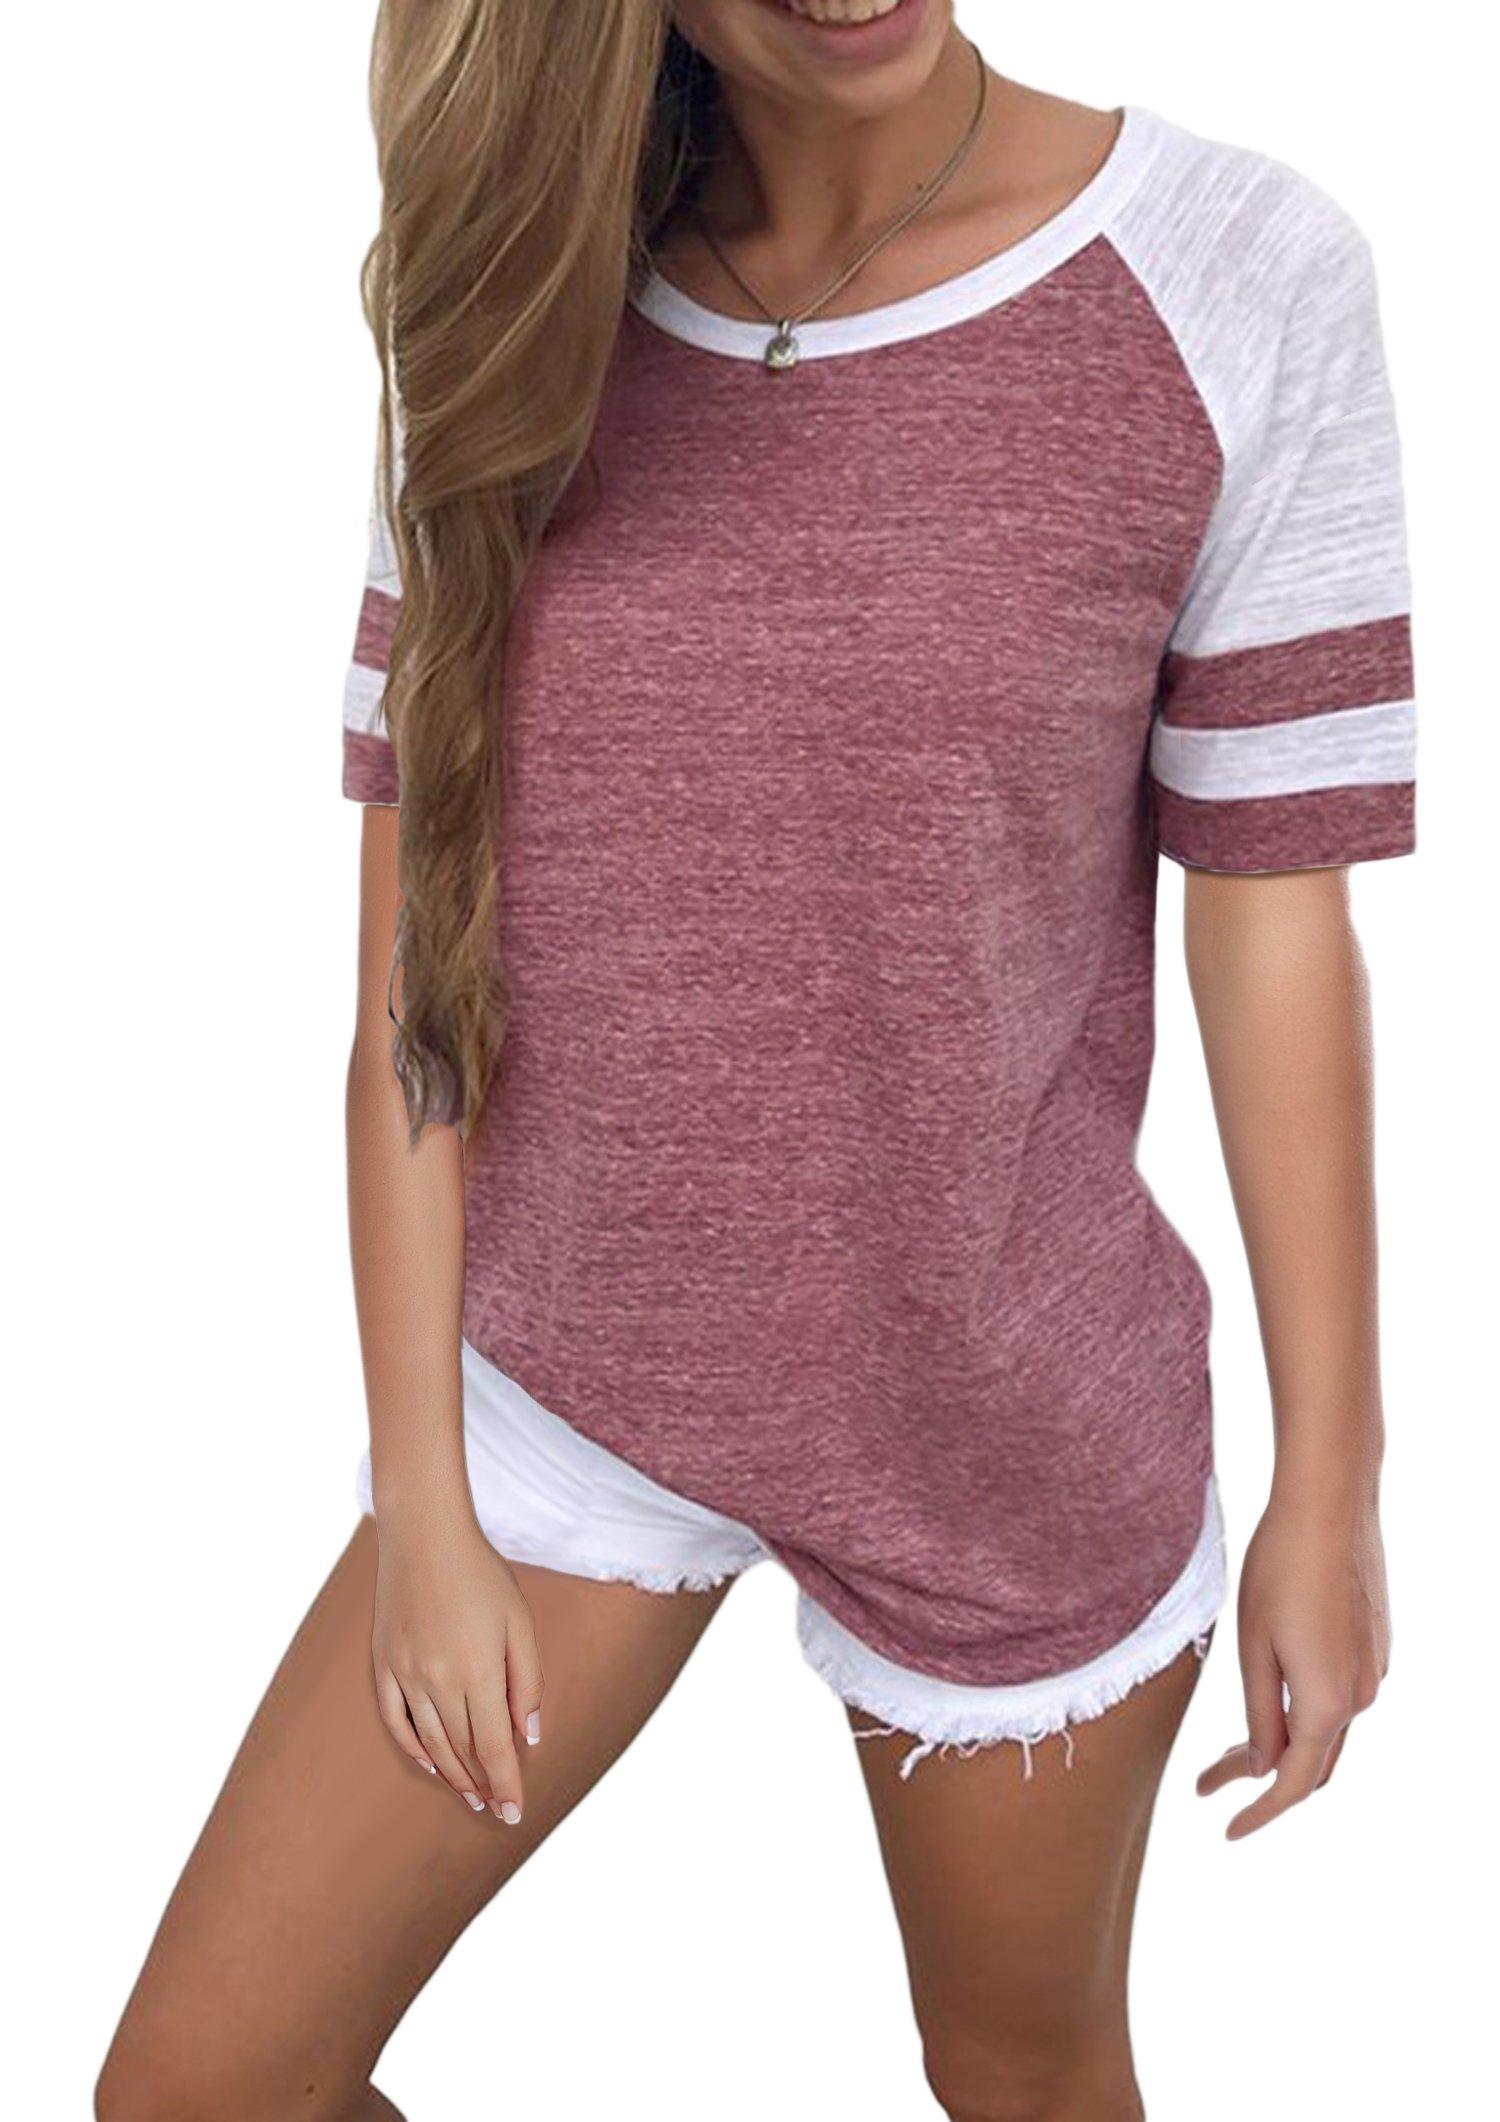 Yidarton Women's Color Block Short Sleeve T Shirt Casual Round Neck Tunic Tops(Wine,S)